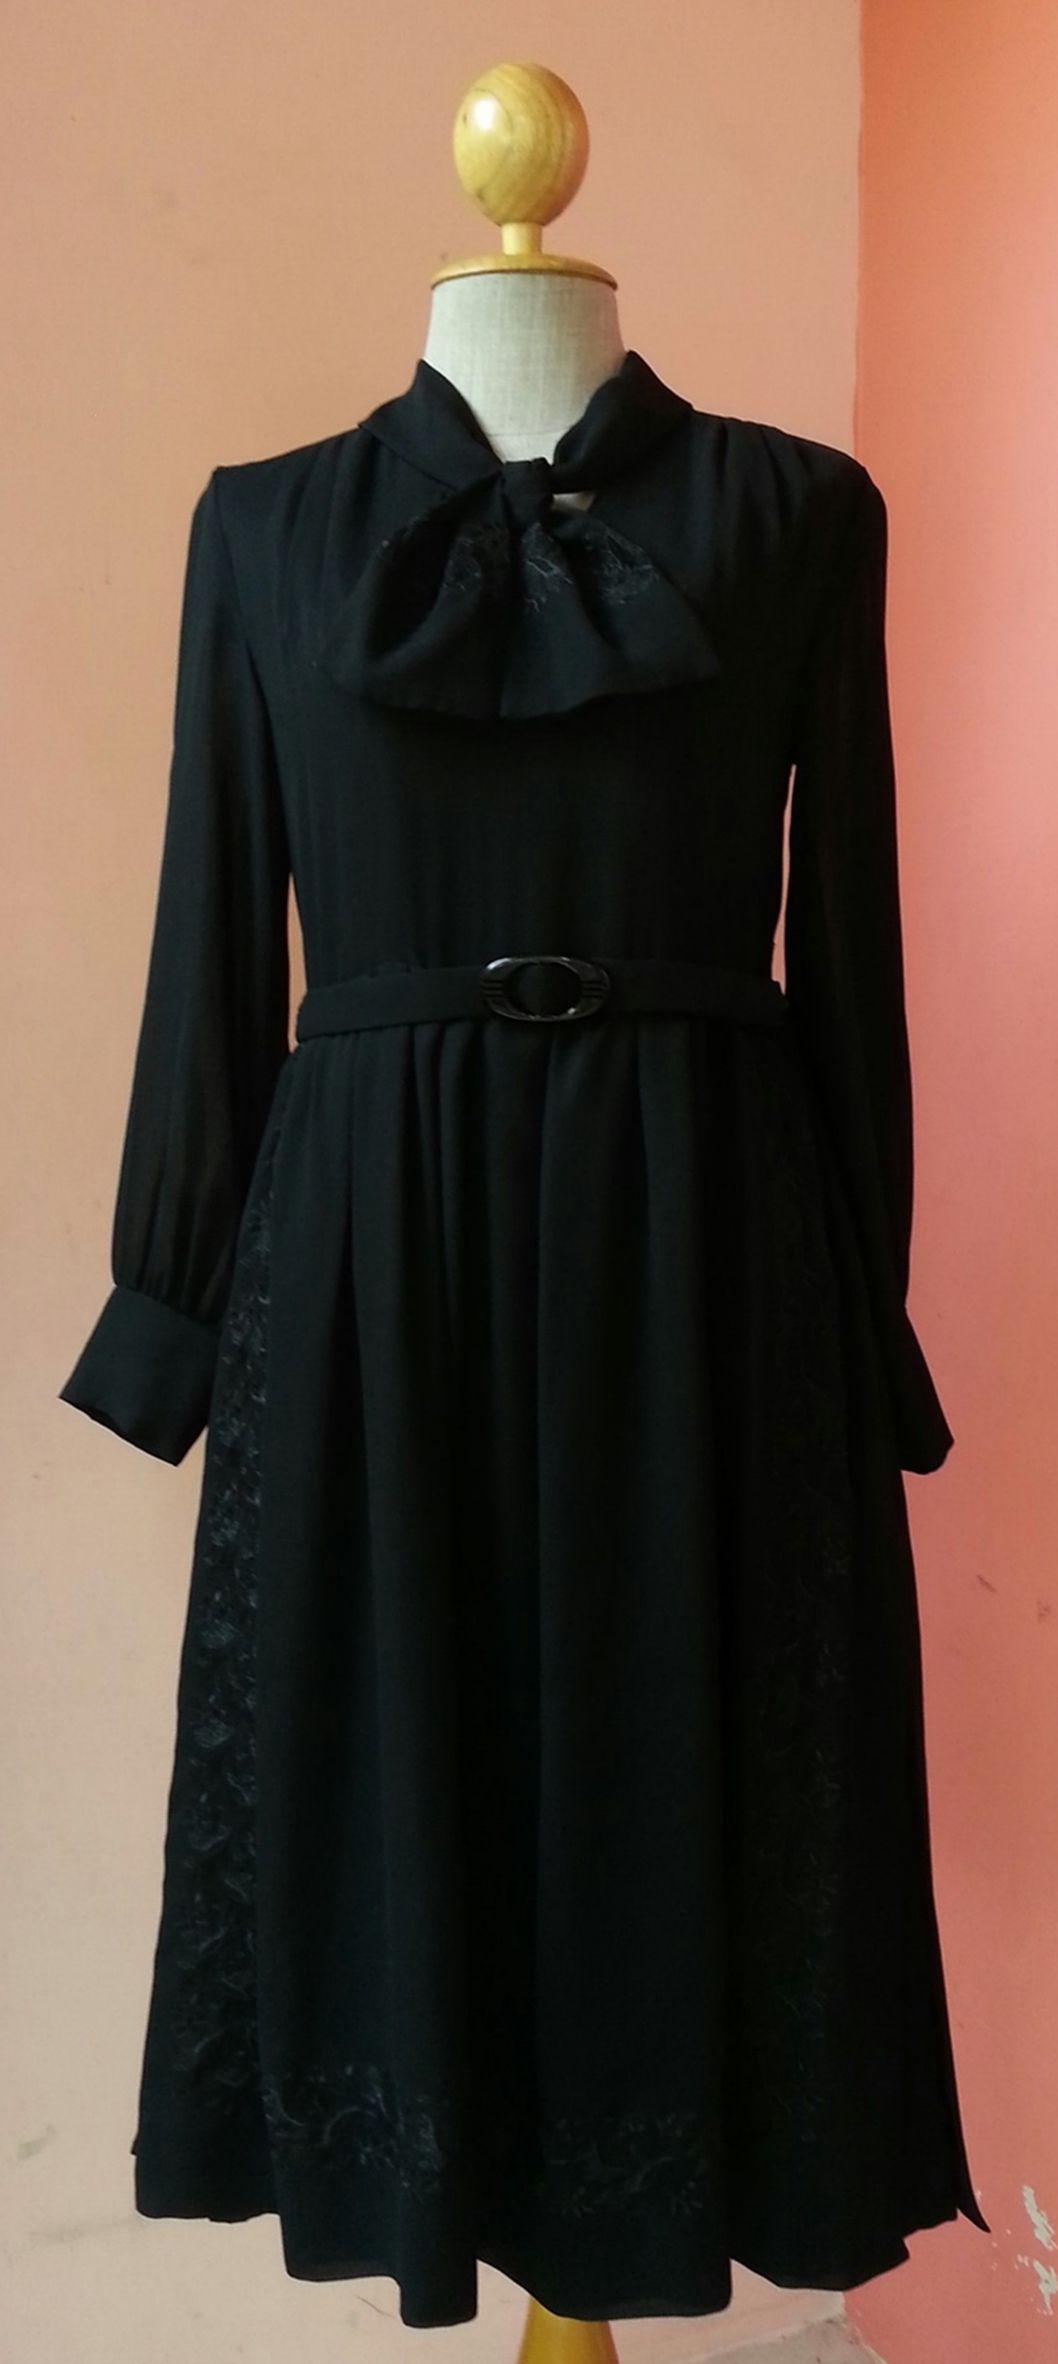 S black dress vintage black prom dress black cocktail dress black